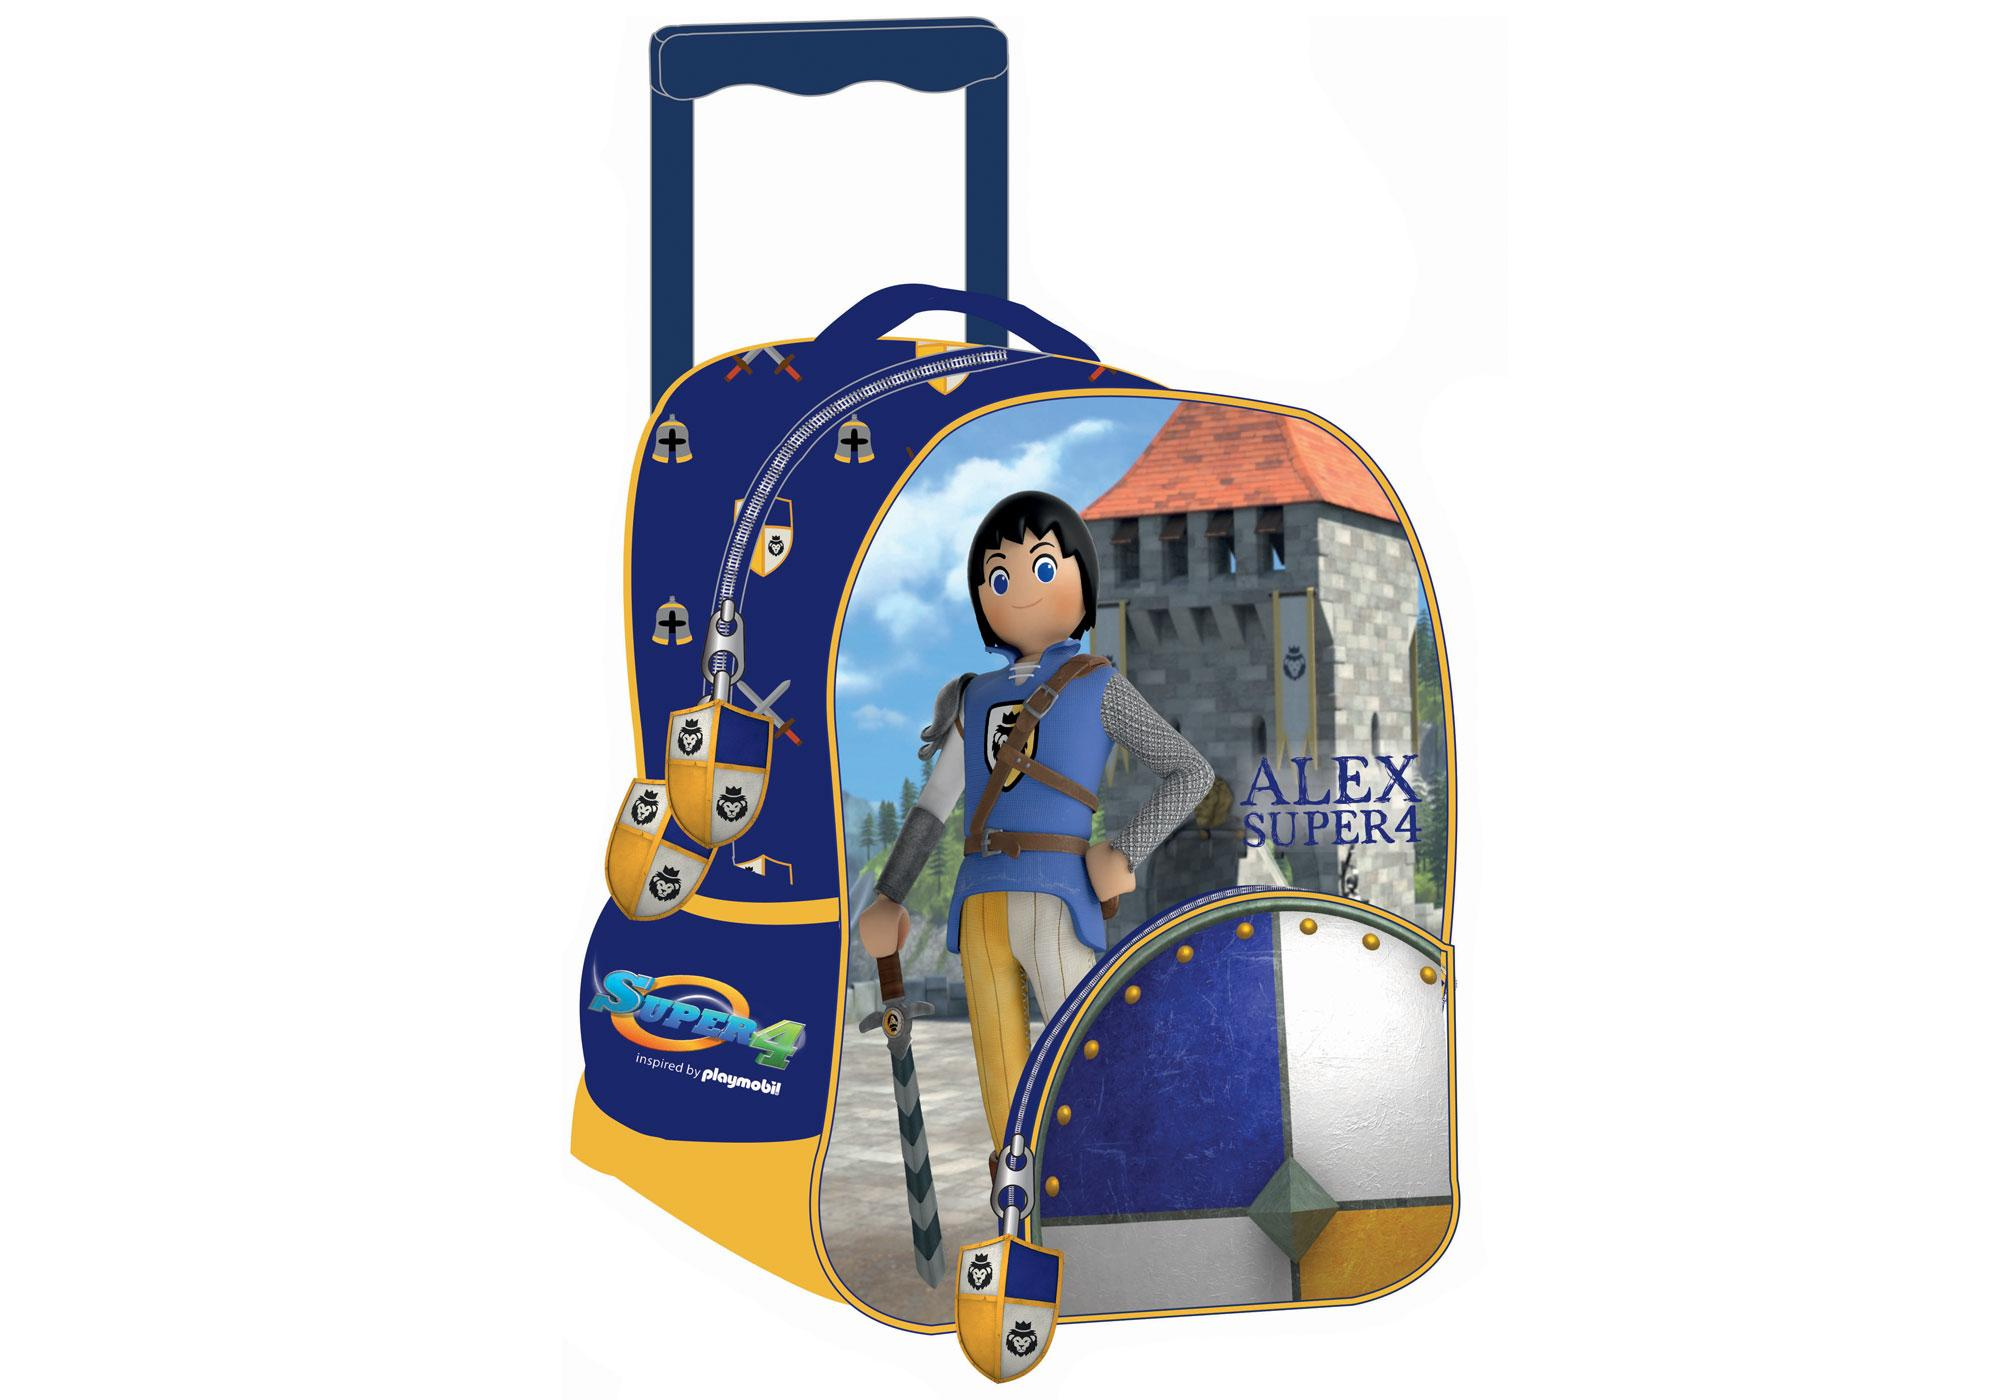 http://media.playmobil.com/i/playmobil/80070_product_detail/Kinder-Trolley - Super 4 Alex